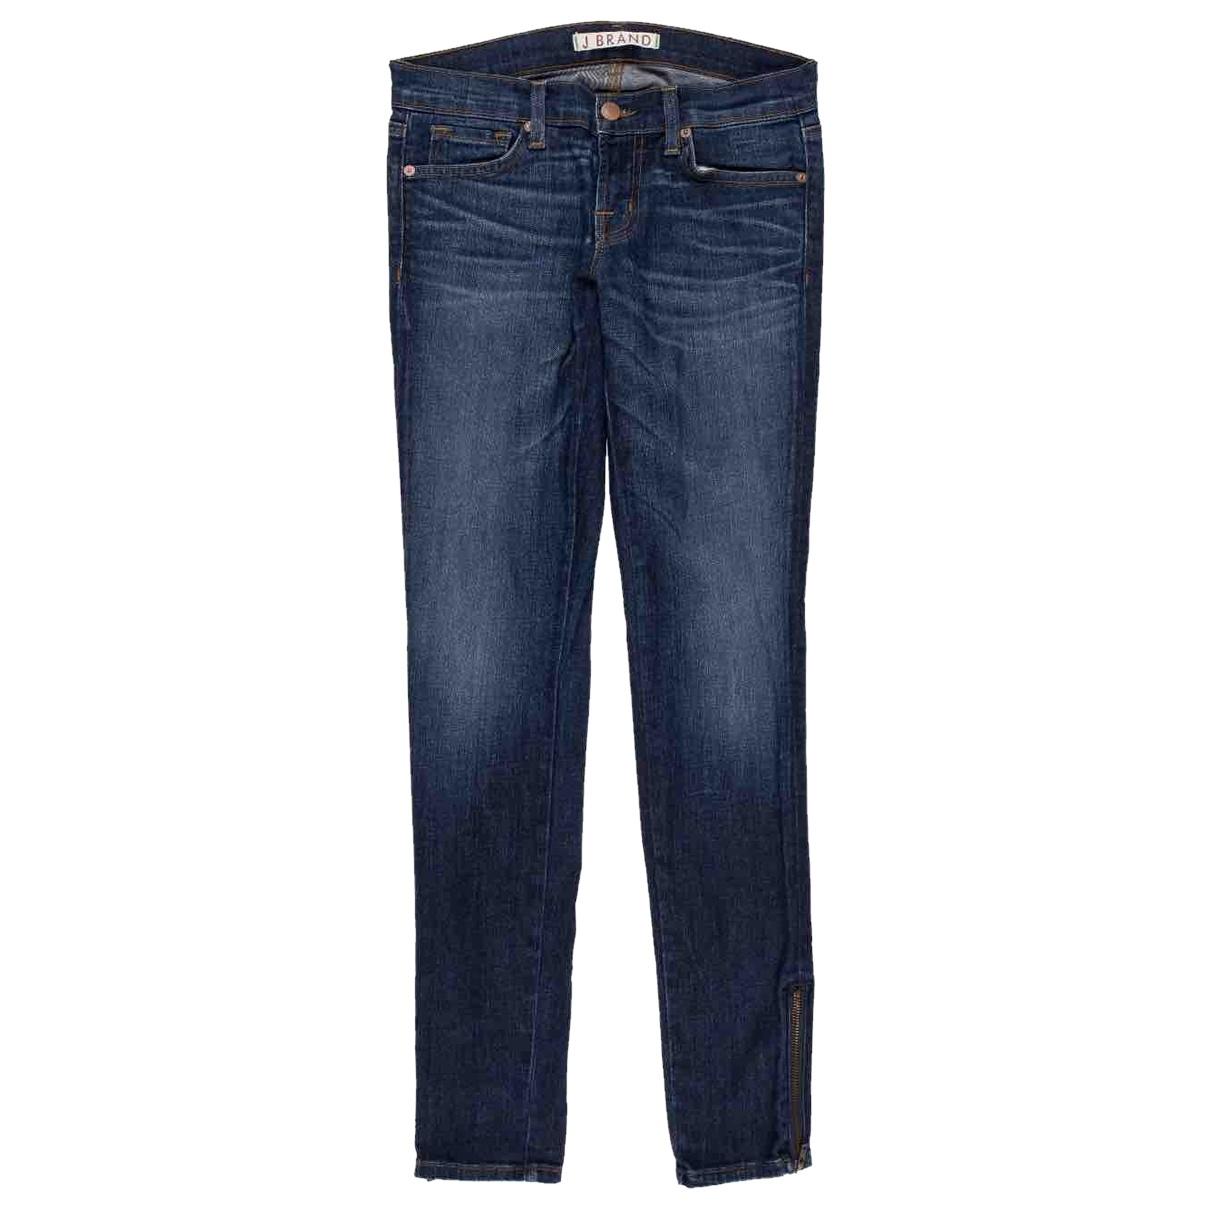 J Brand \N Blue Denim - Jeans Jeans for Women 25 US